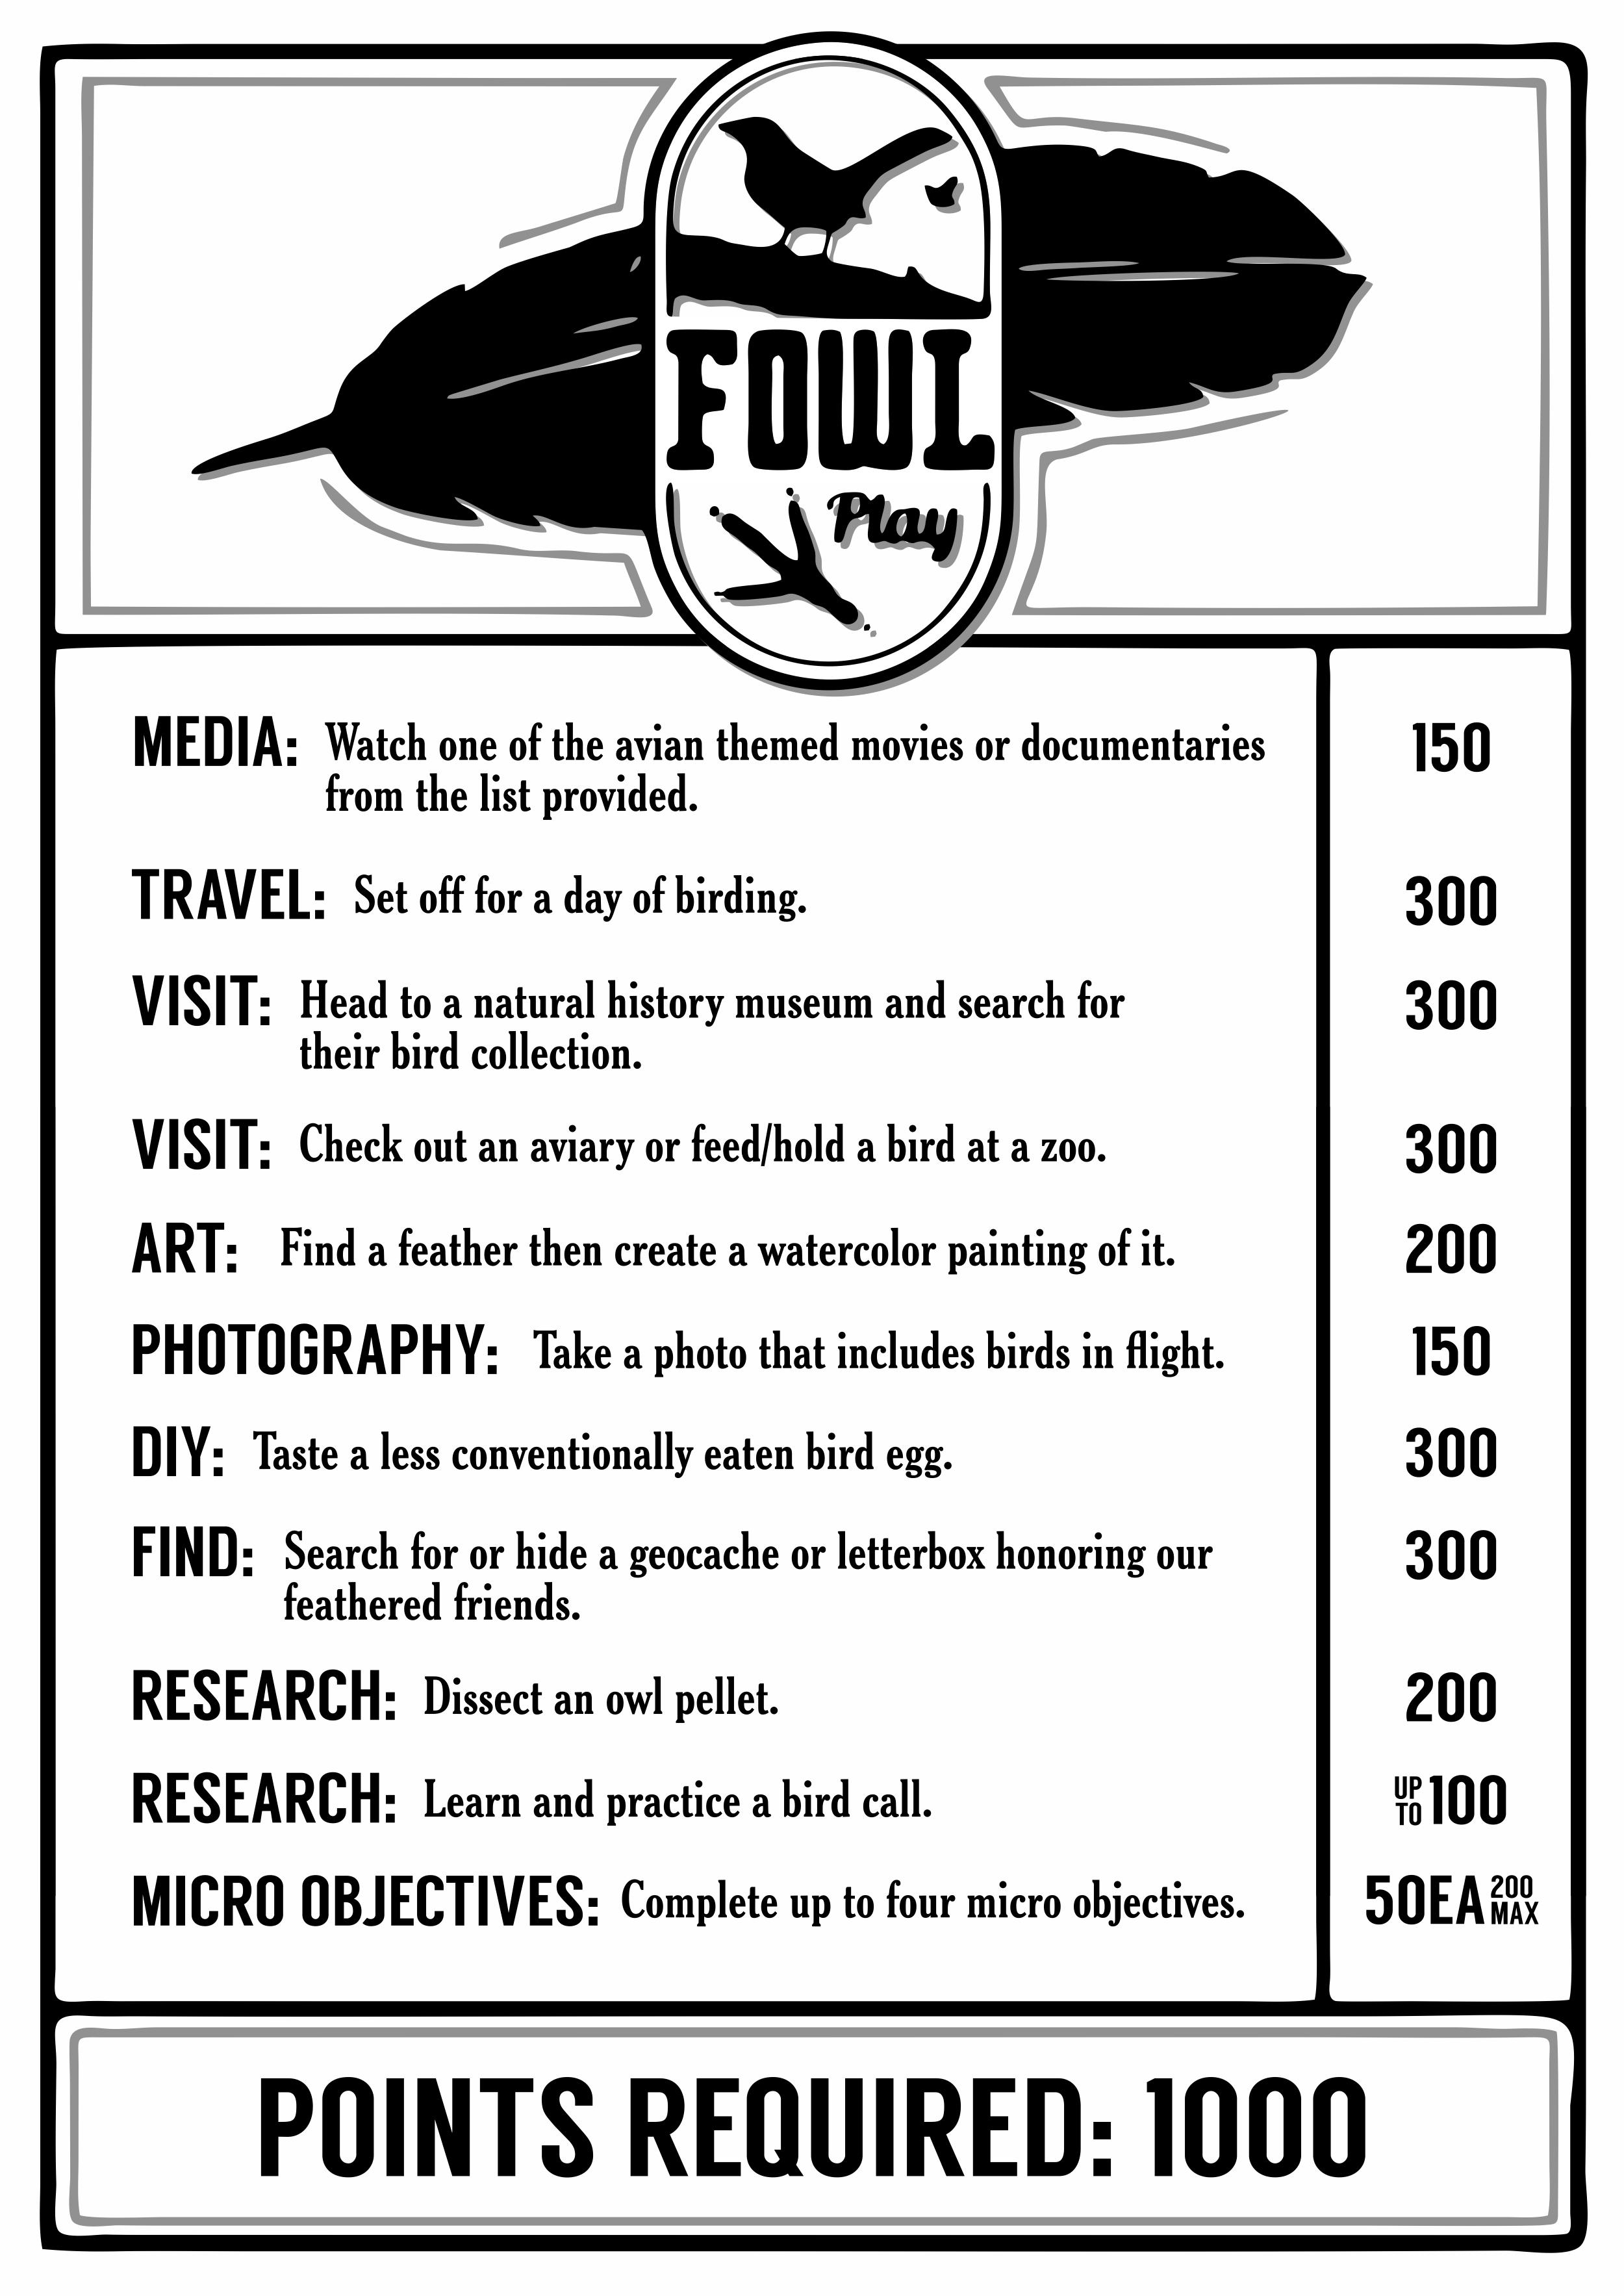 fowl-play-objective-card-production.jpg